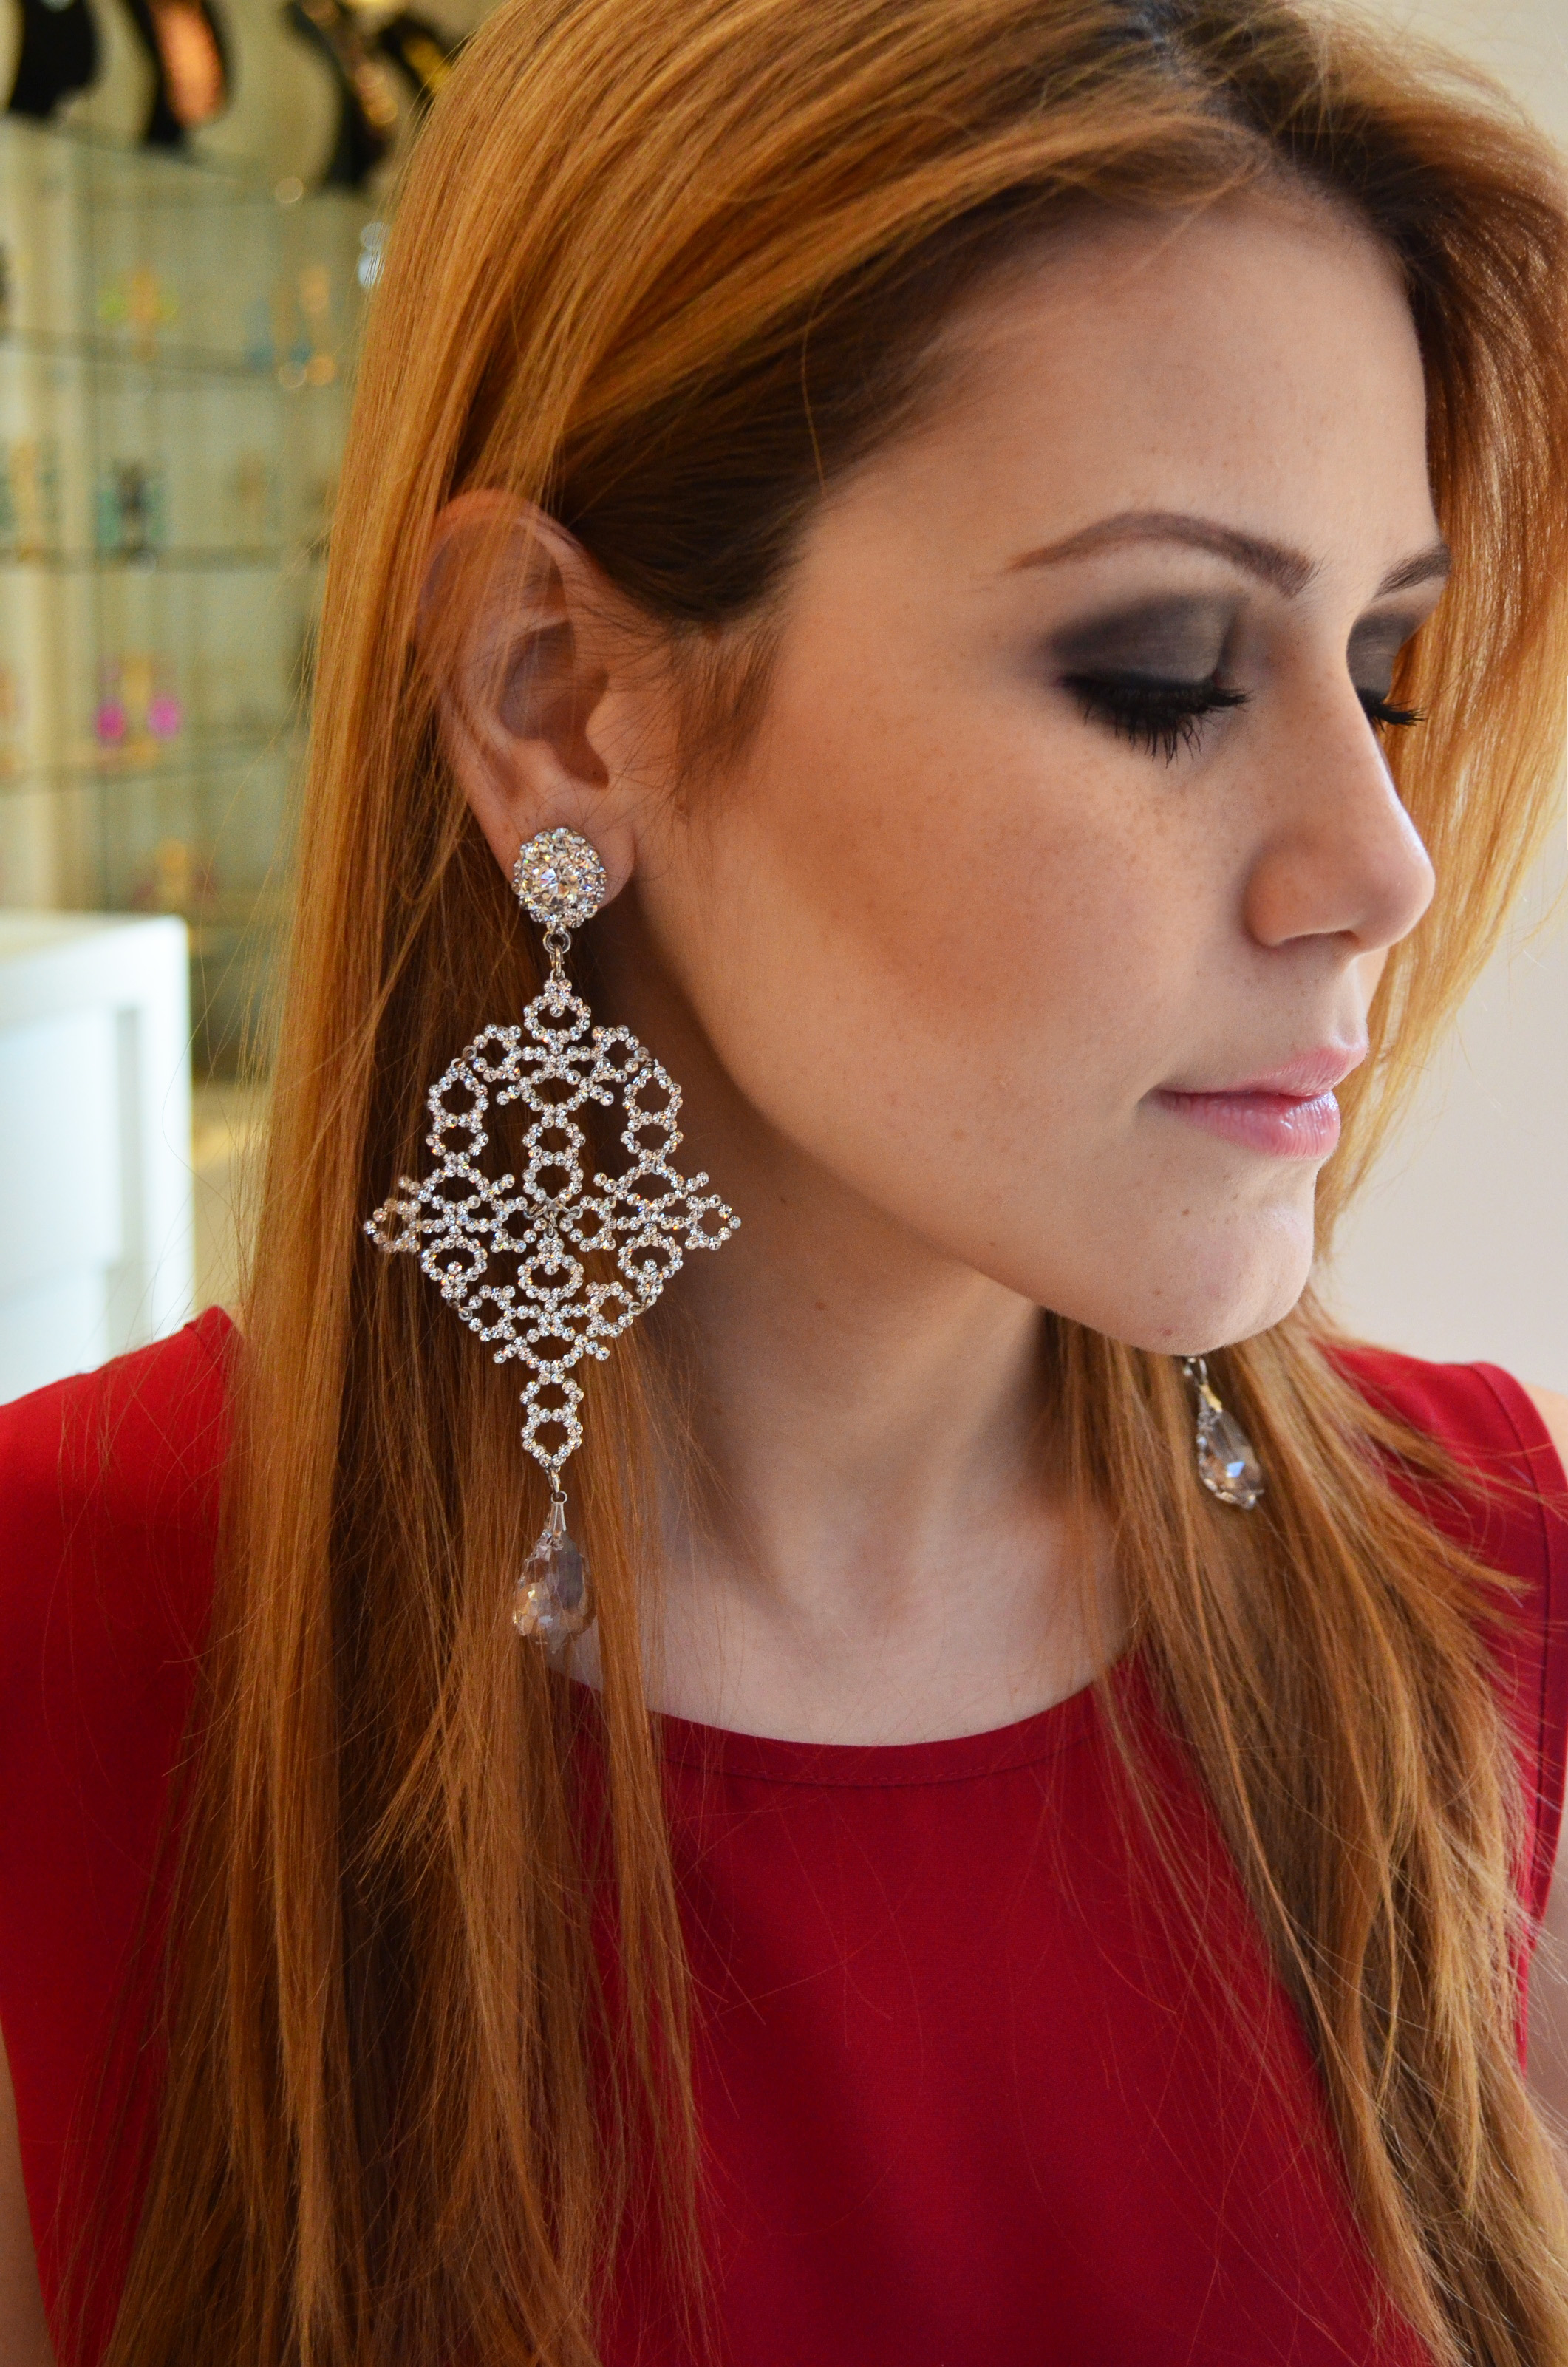 Look Fire And Ice - Letícia Sarabia 5